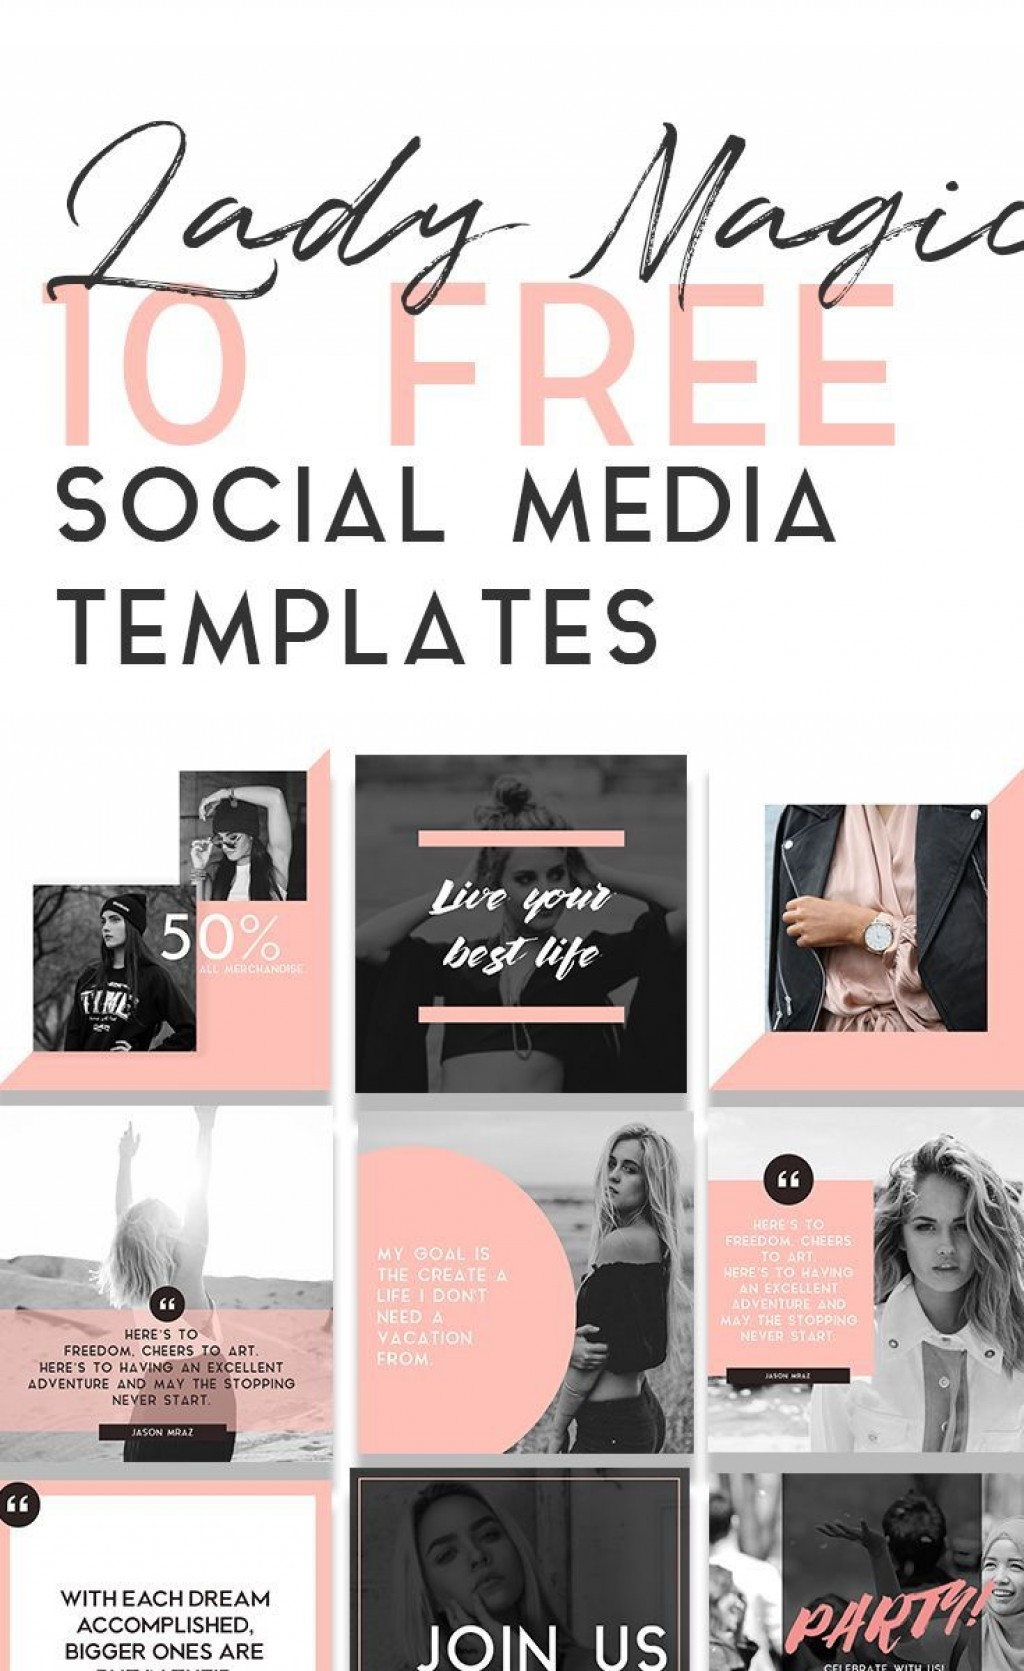 000 Striking Free Social Media Template Sample  Templates Website Design Post Download For PowerpointLarge